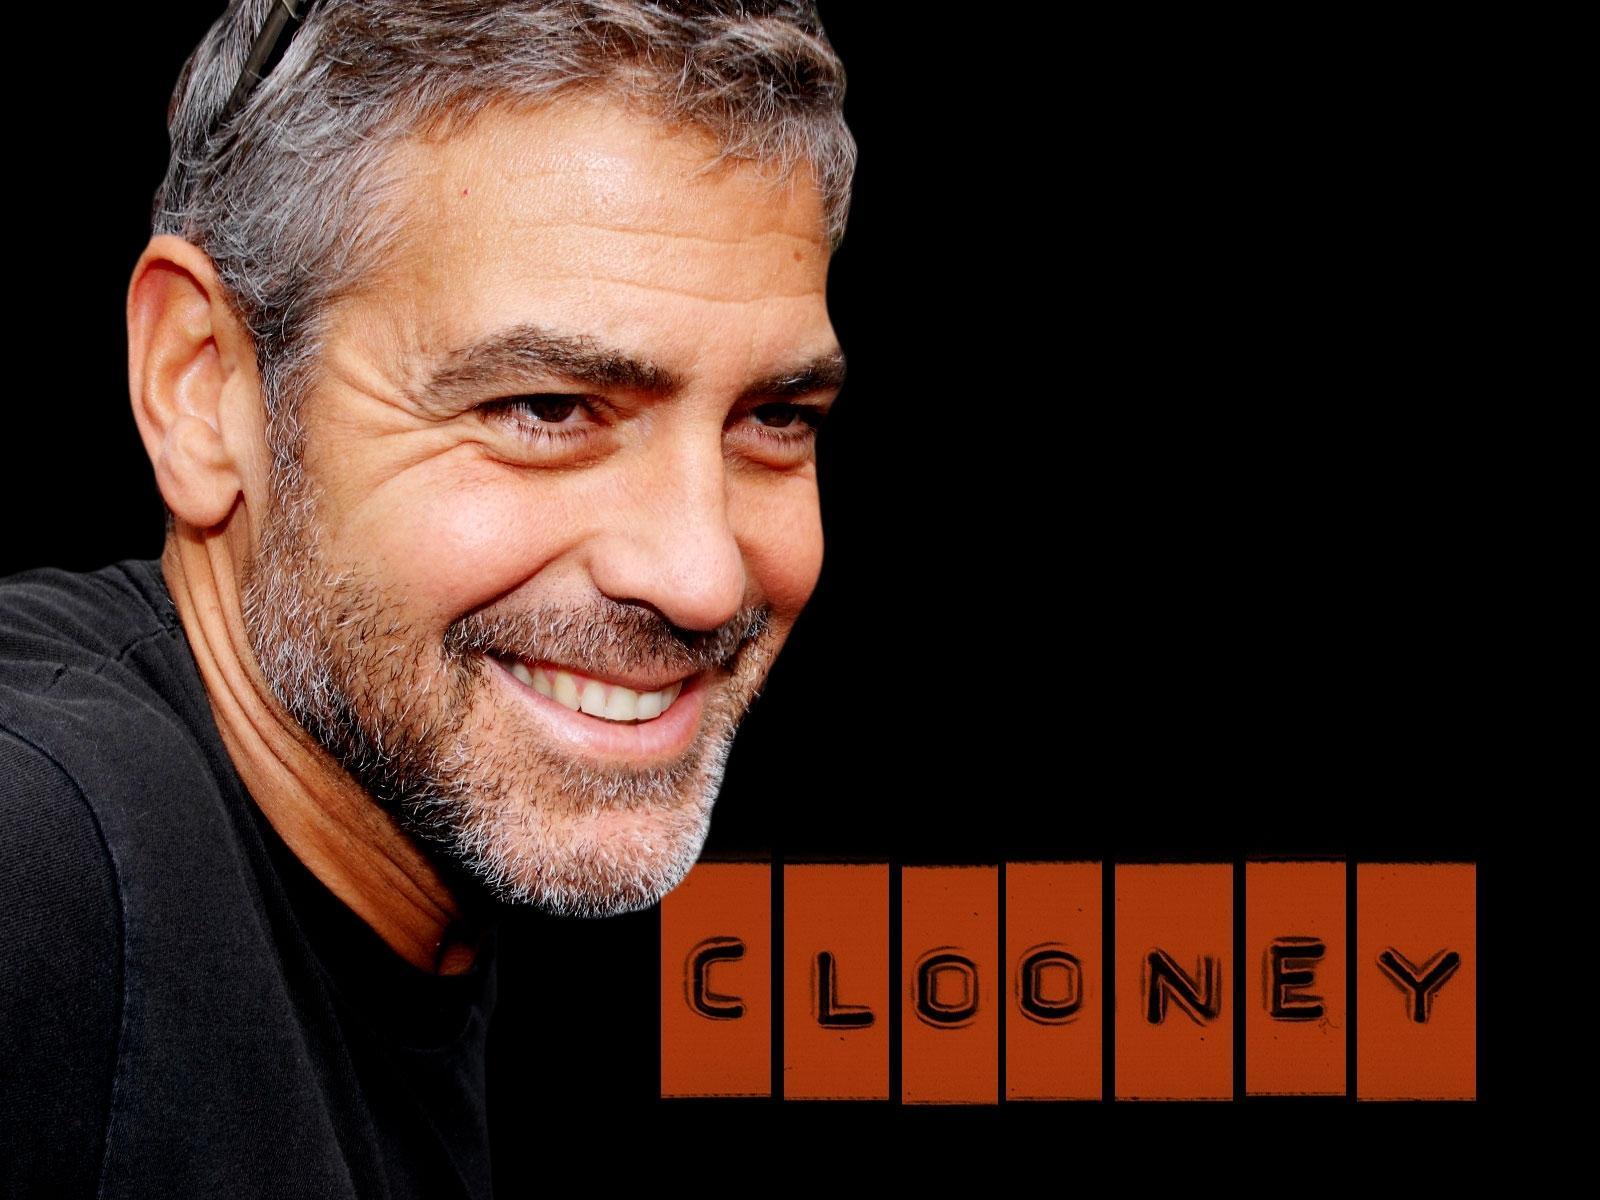 Images George Clooney Celebrities 1600x1200